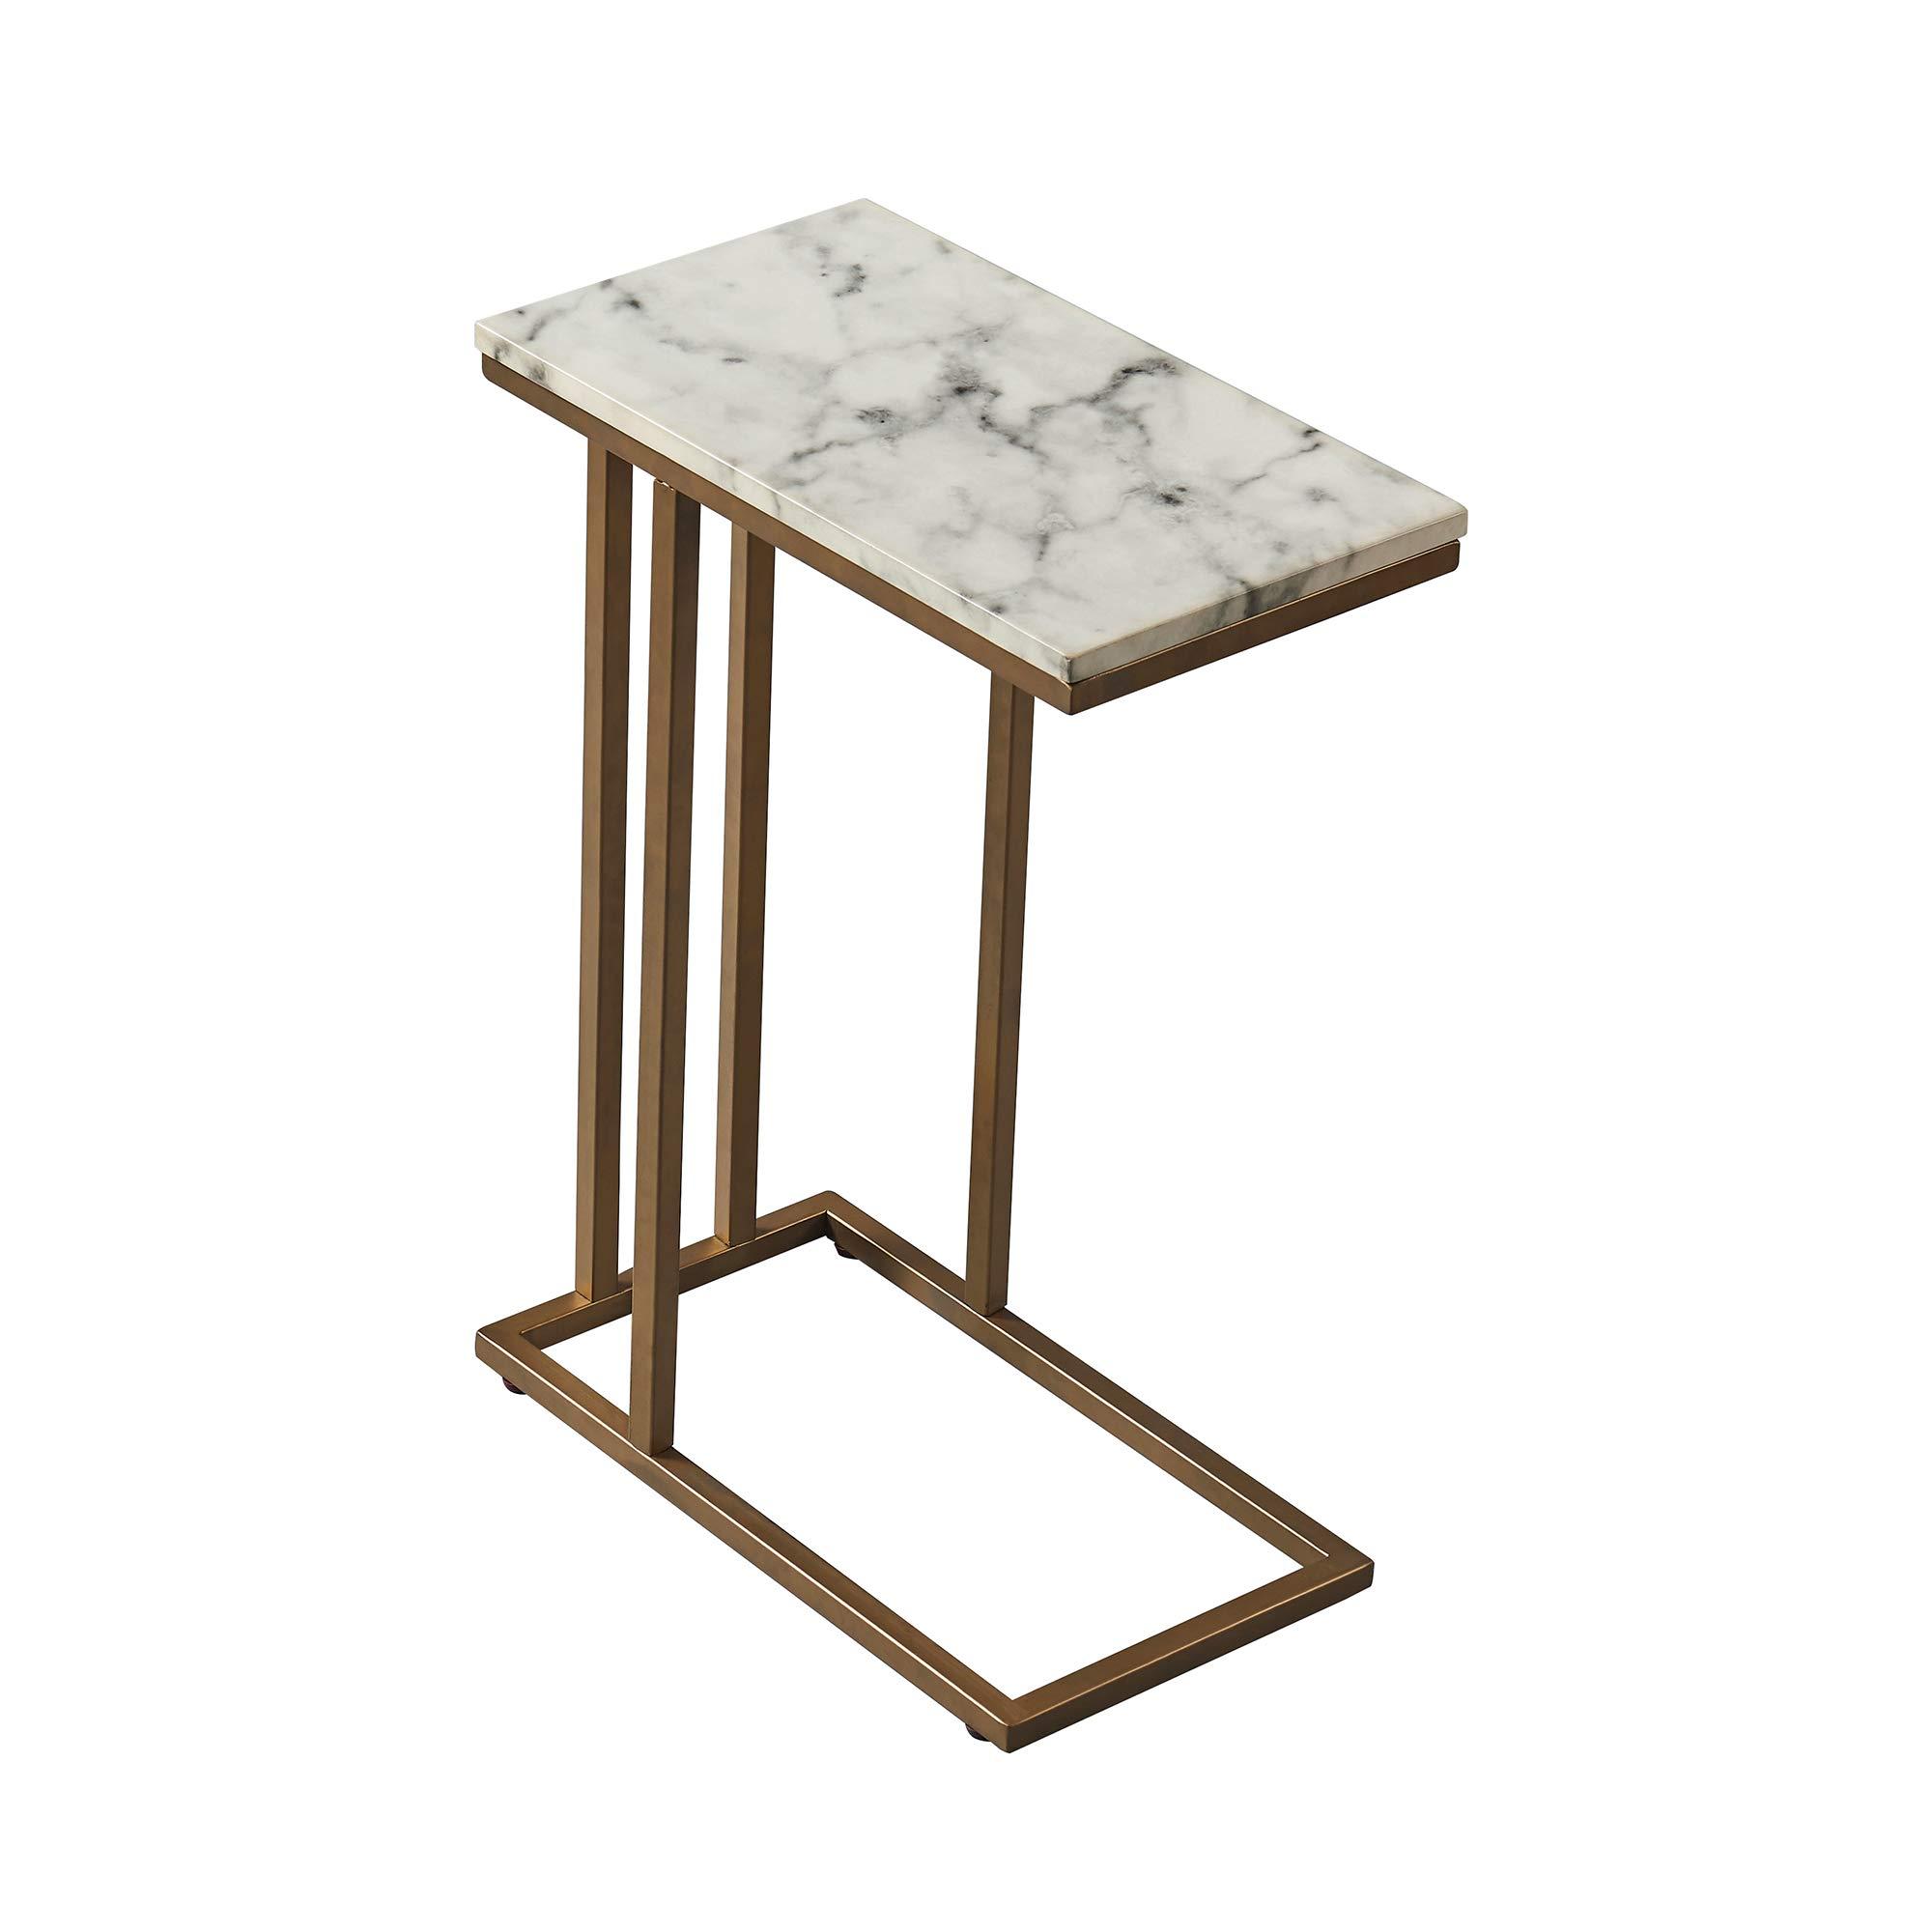 Versanora - Marmo C Shape Table - Faux Marble /Brass